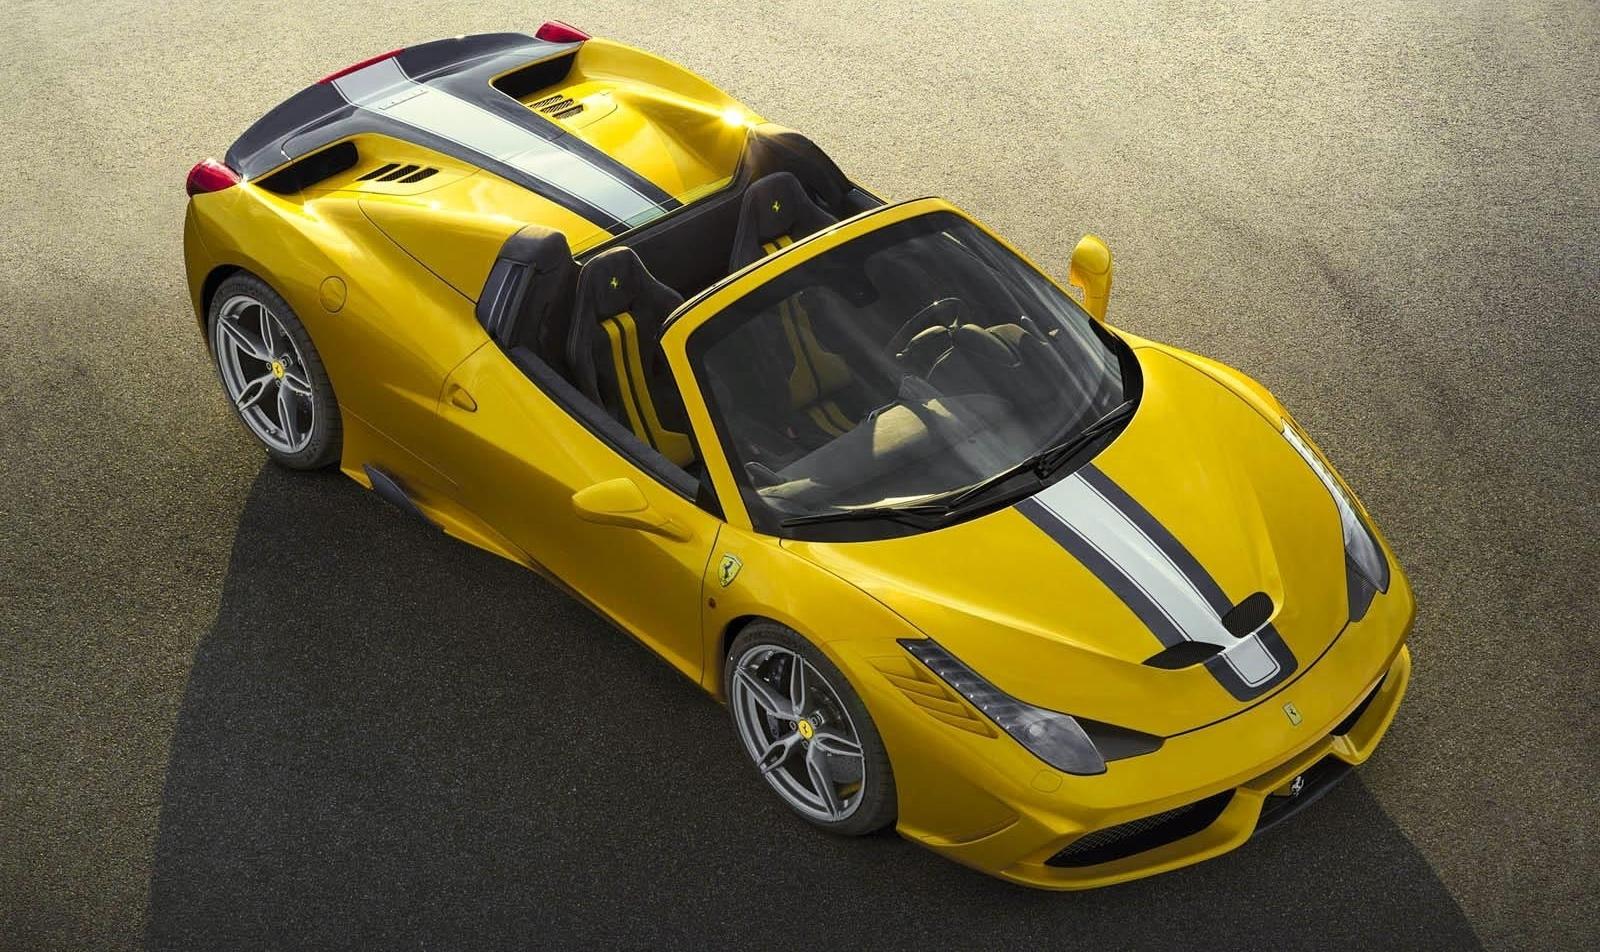 Ferrari Limited Editions Ferrari 458 Speciale Aperta